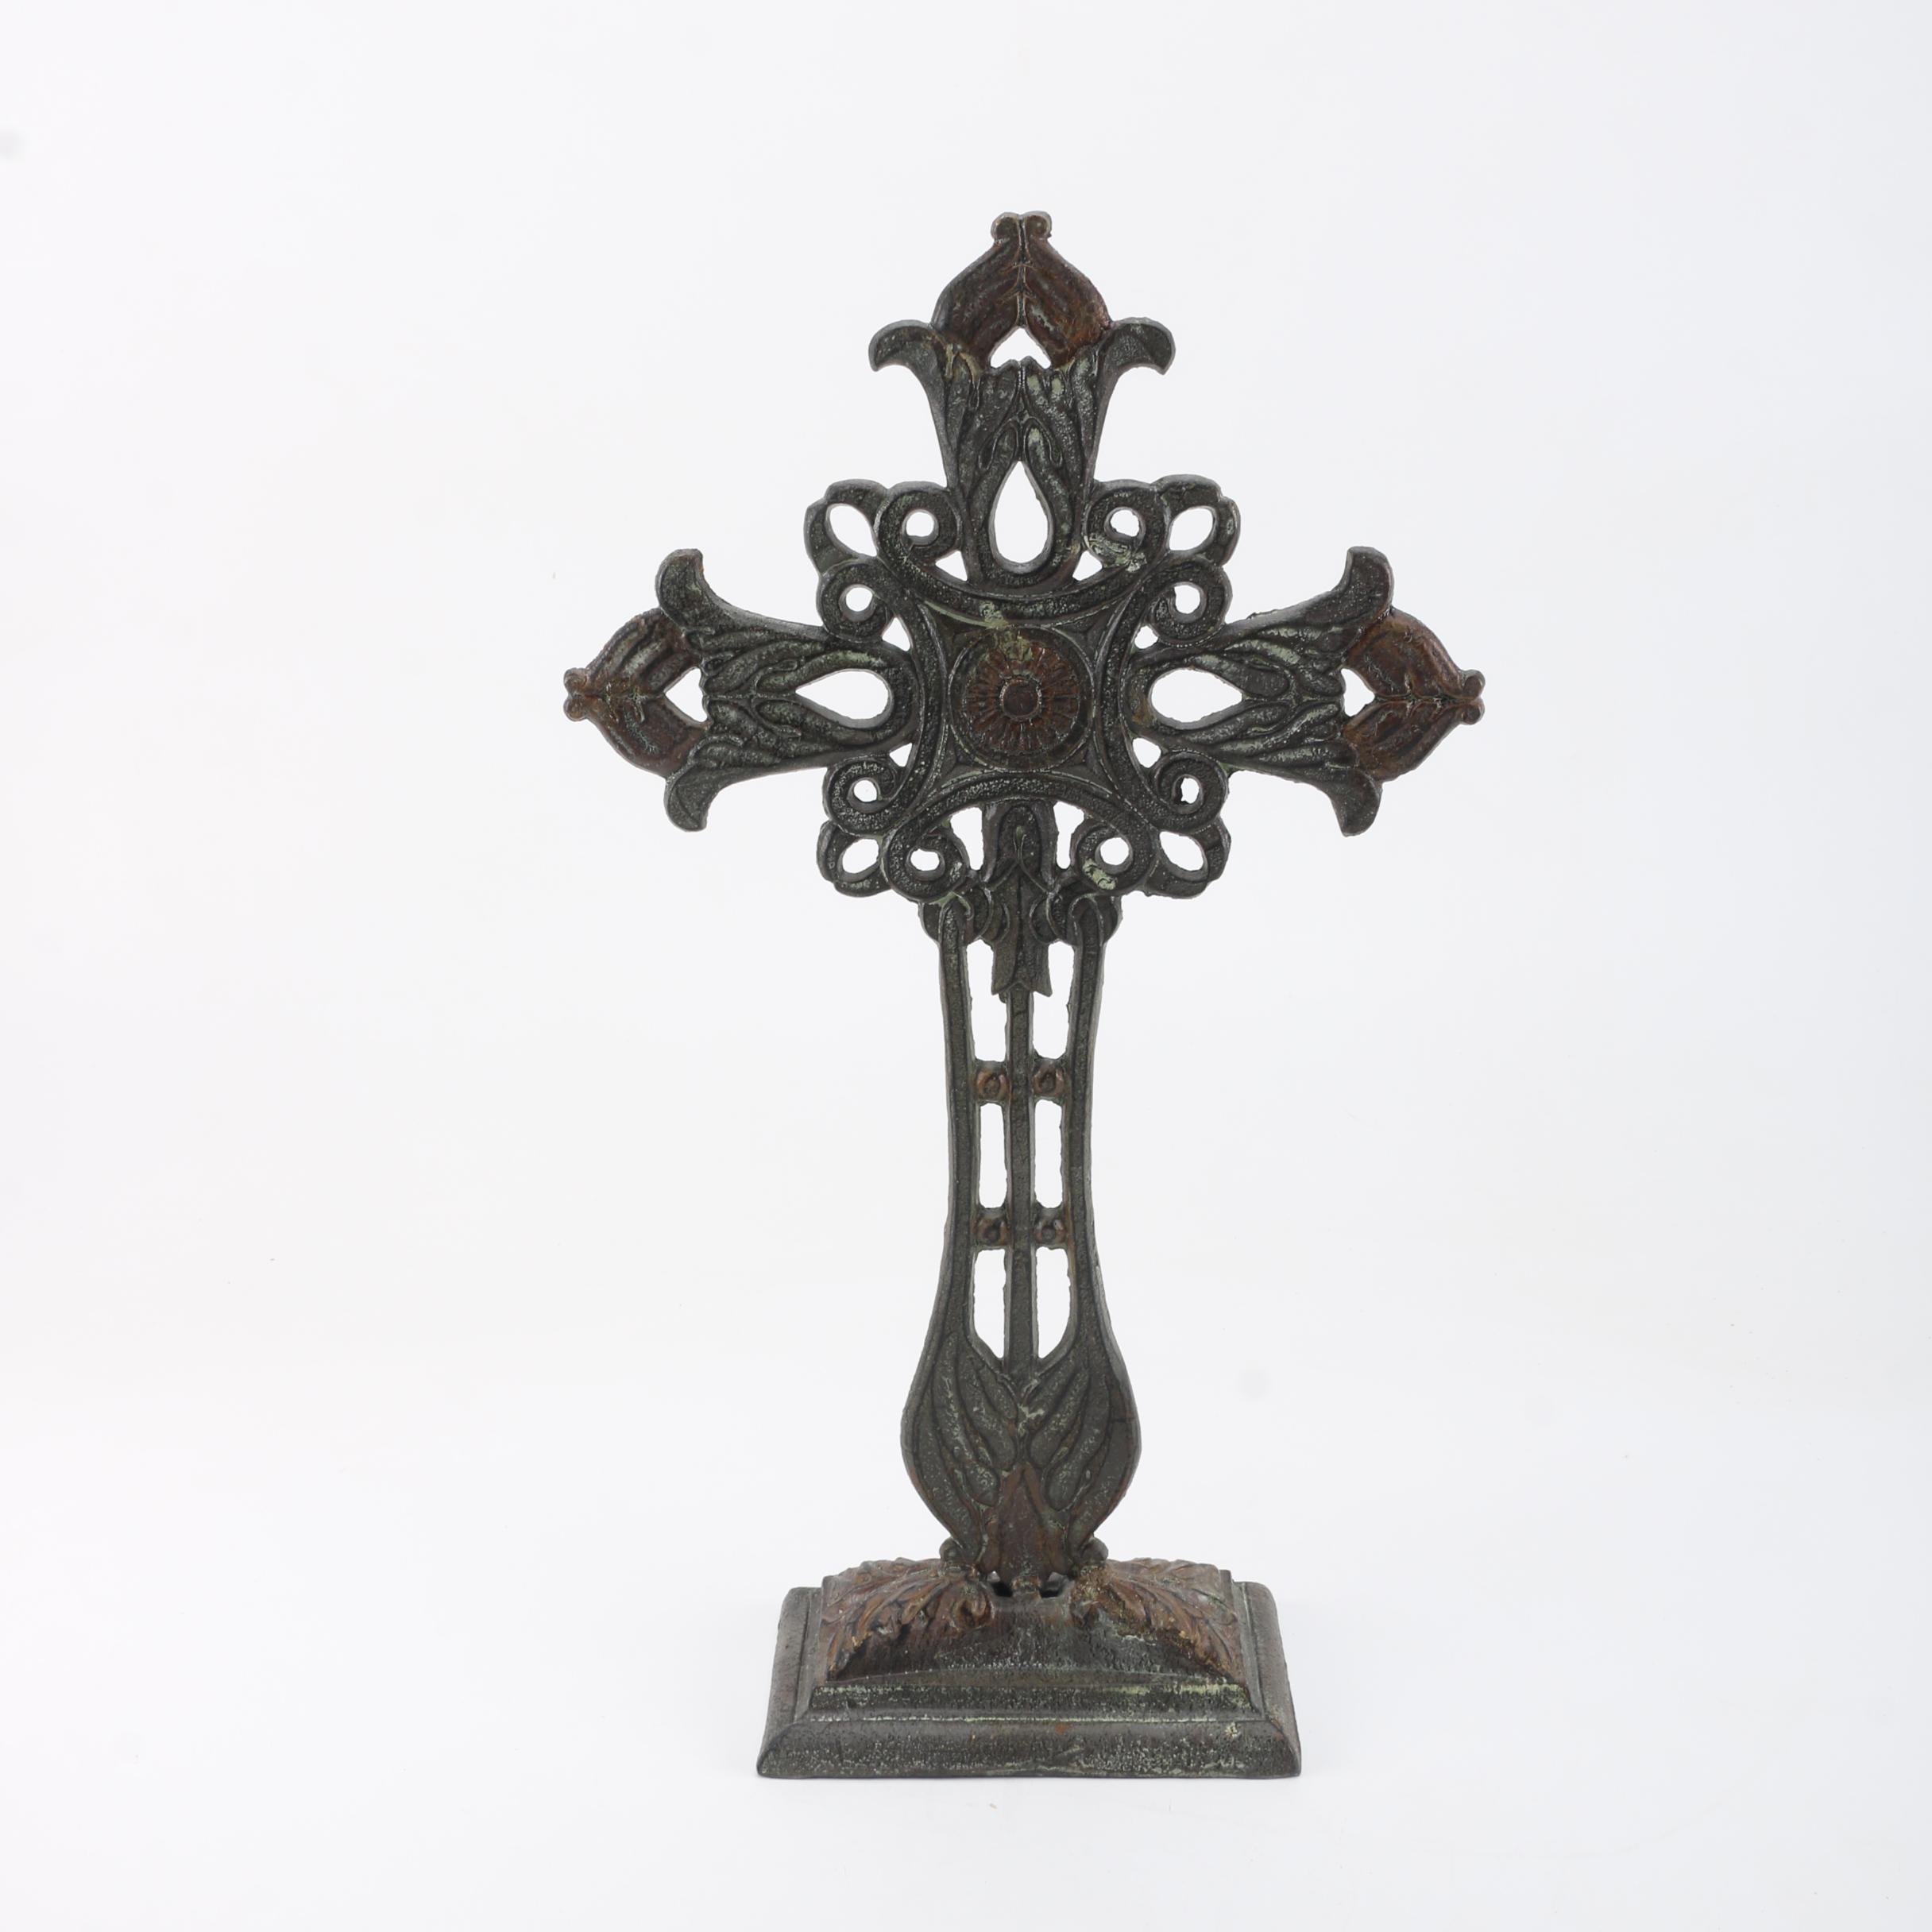 Large Ornate Cast Metal Cross